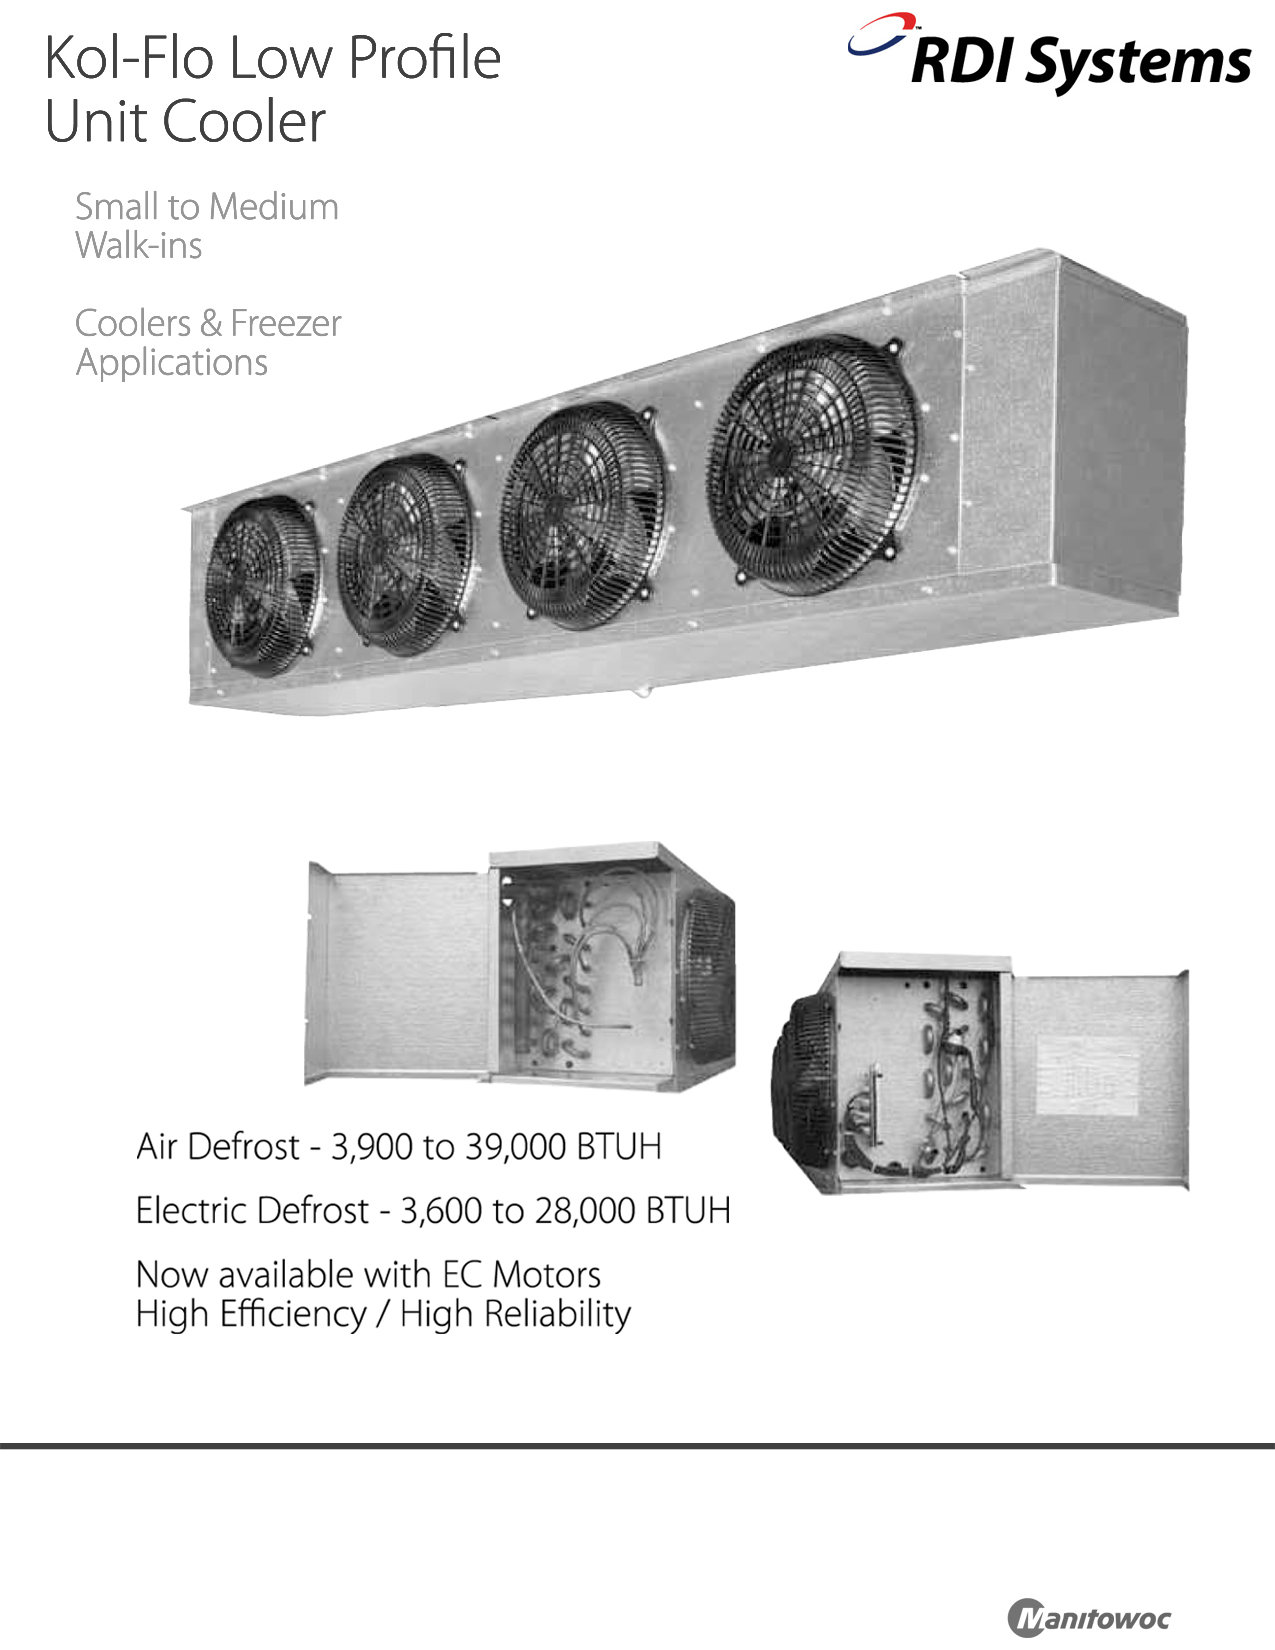 rdi refrigeration unit wiring diagrams rdi refrigeration systems kol flo low profile cooler unit air  kol flo low profile cooler unit